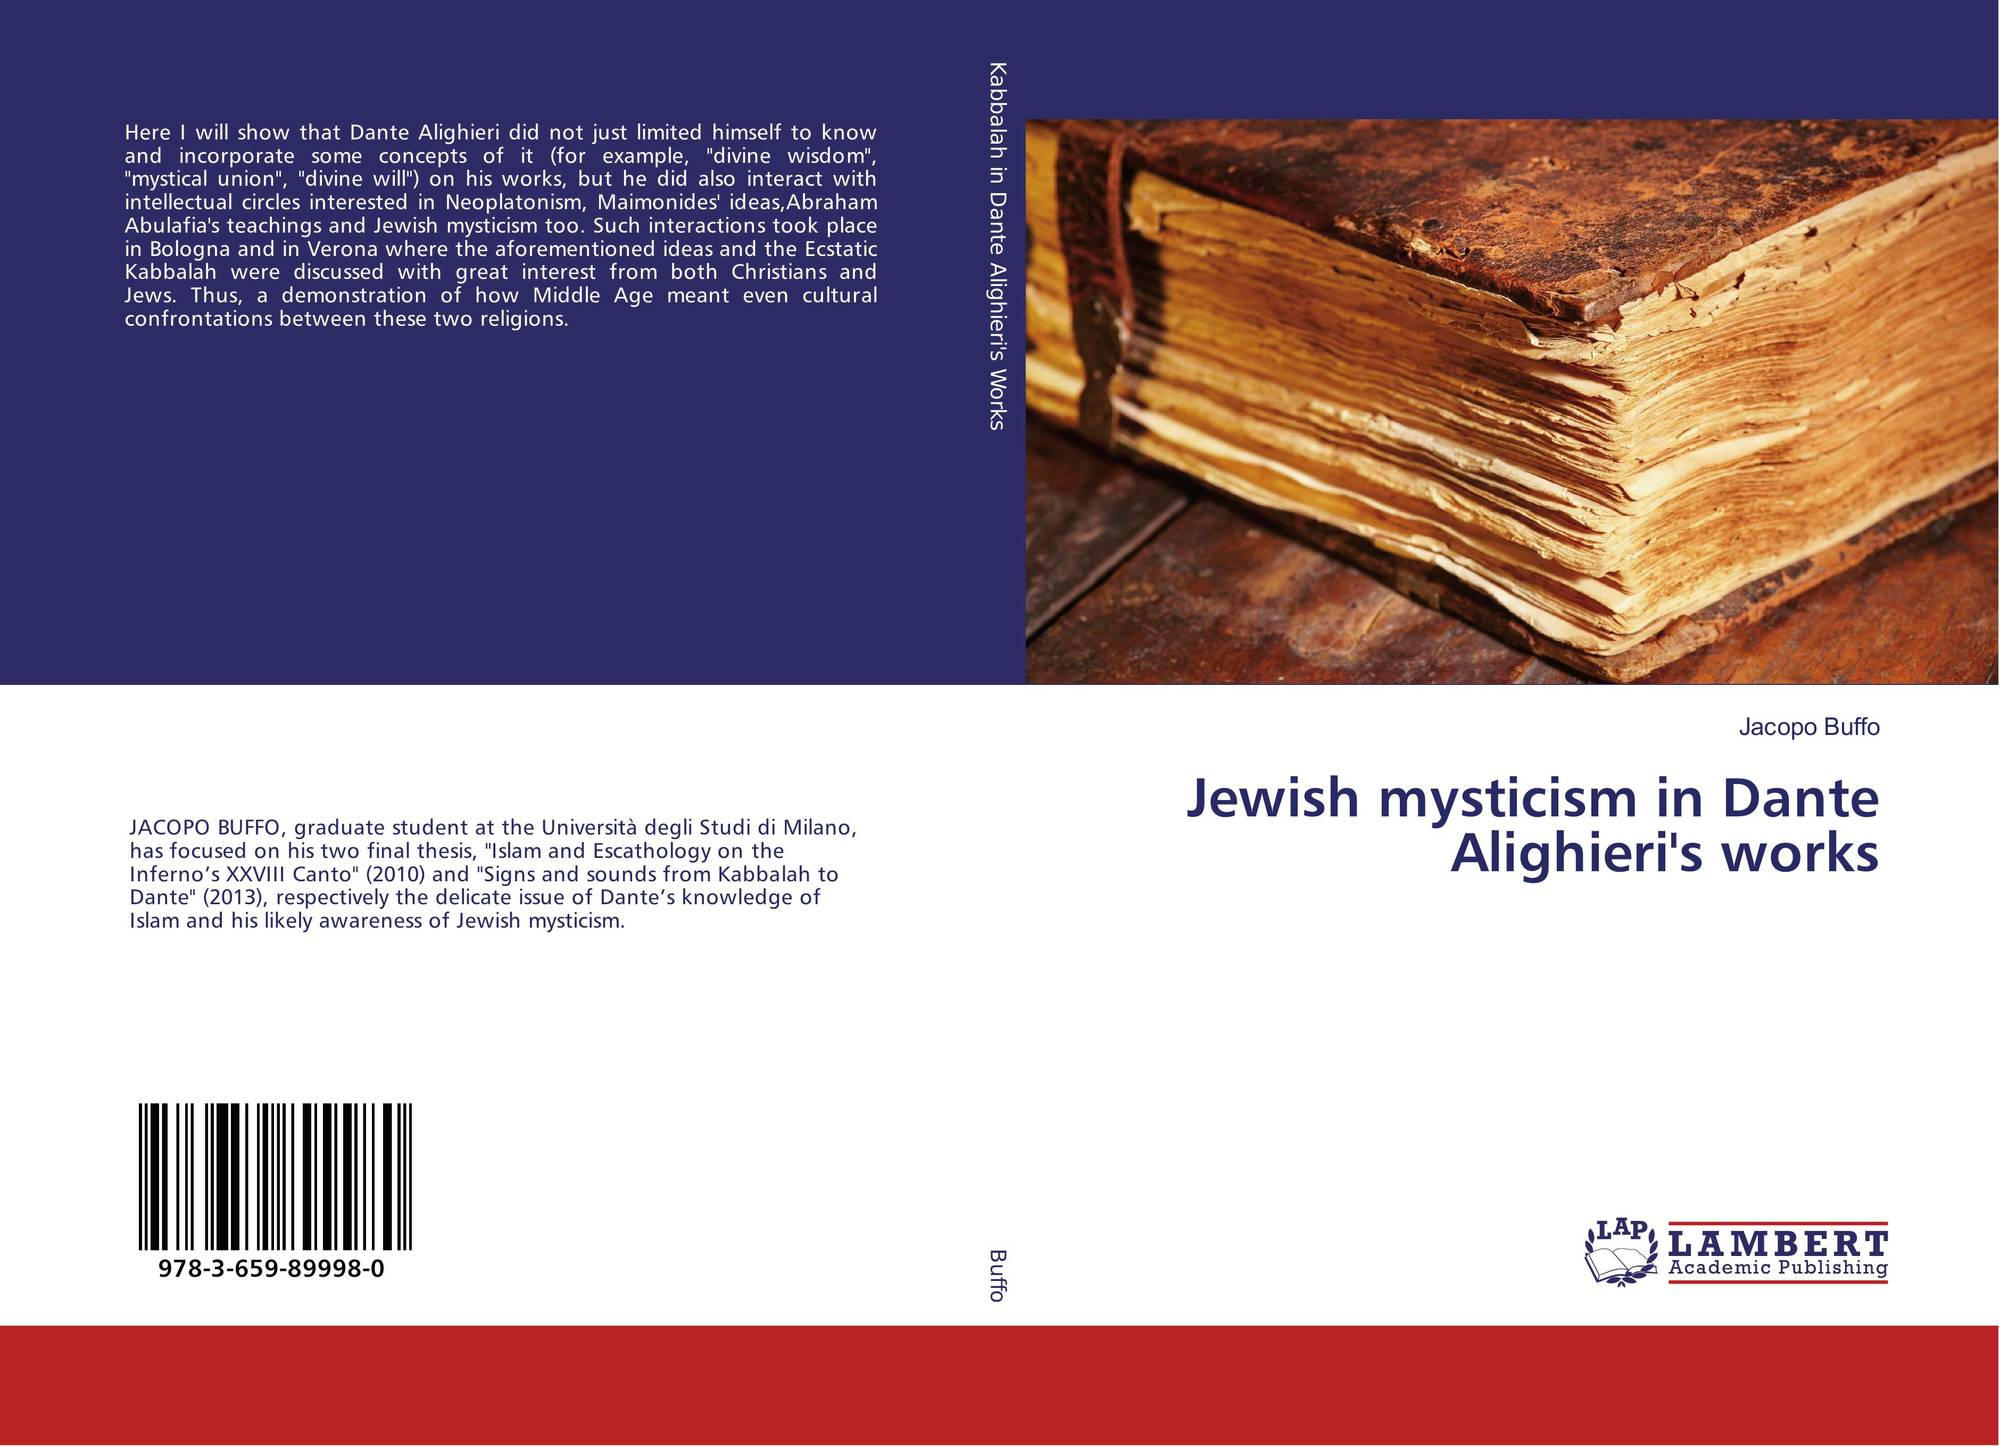 Jewish mysticism in Dante Alighieri's works, 978-3-659-89998